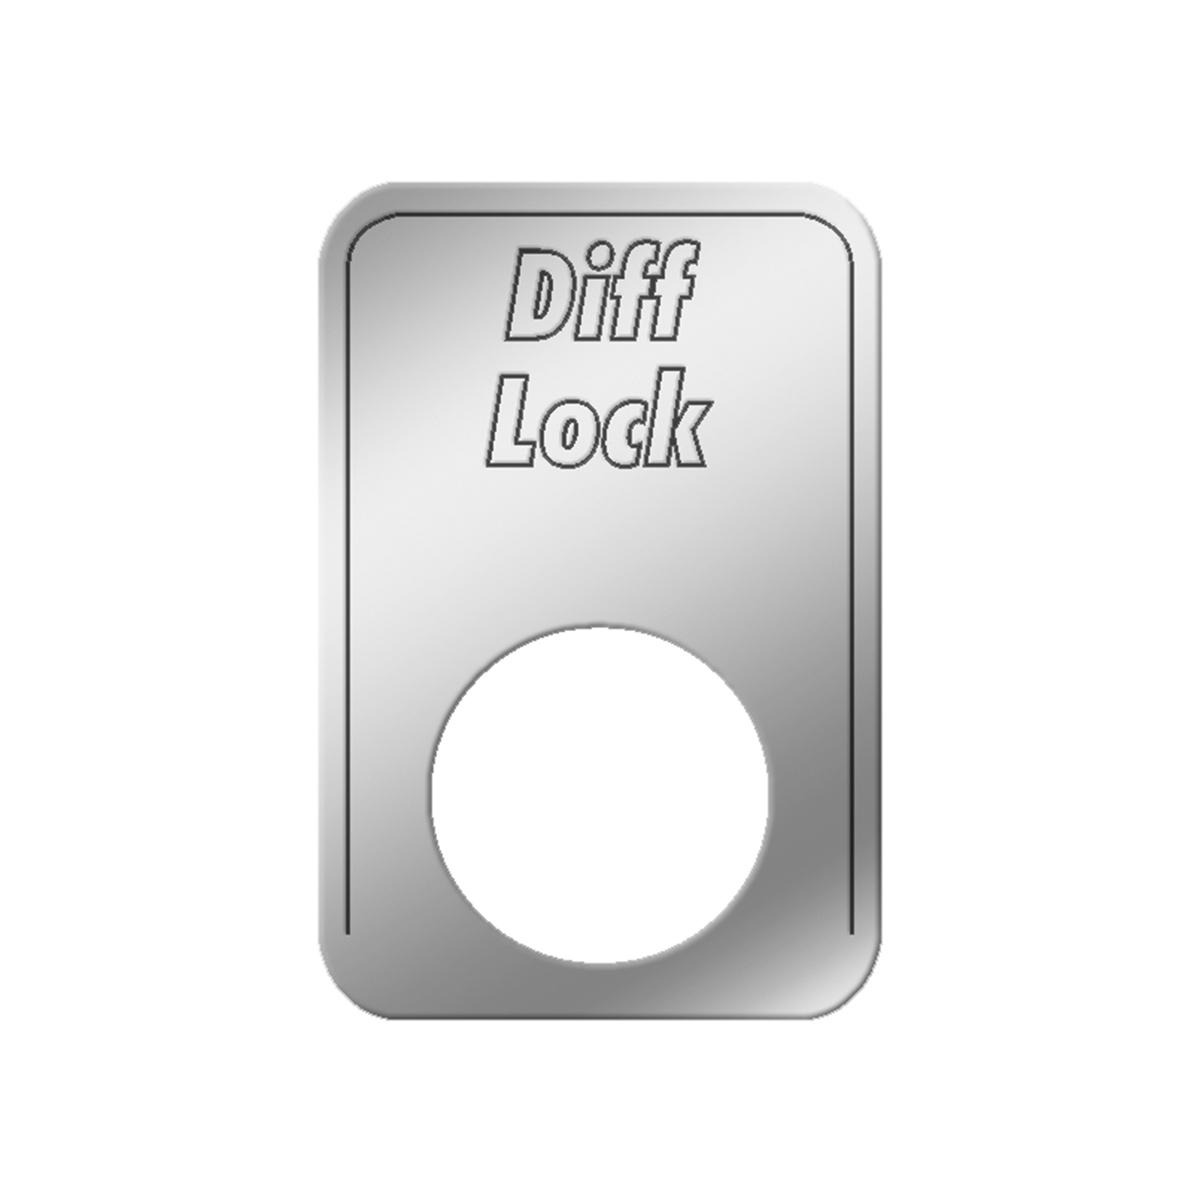 #68559 Full Locking Main Differential Indicator Light